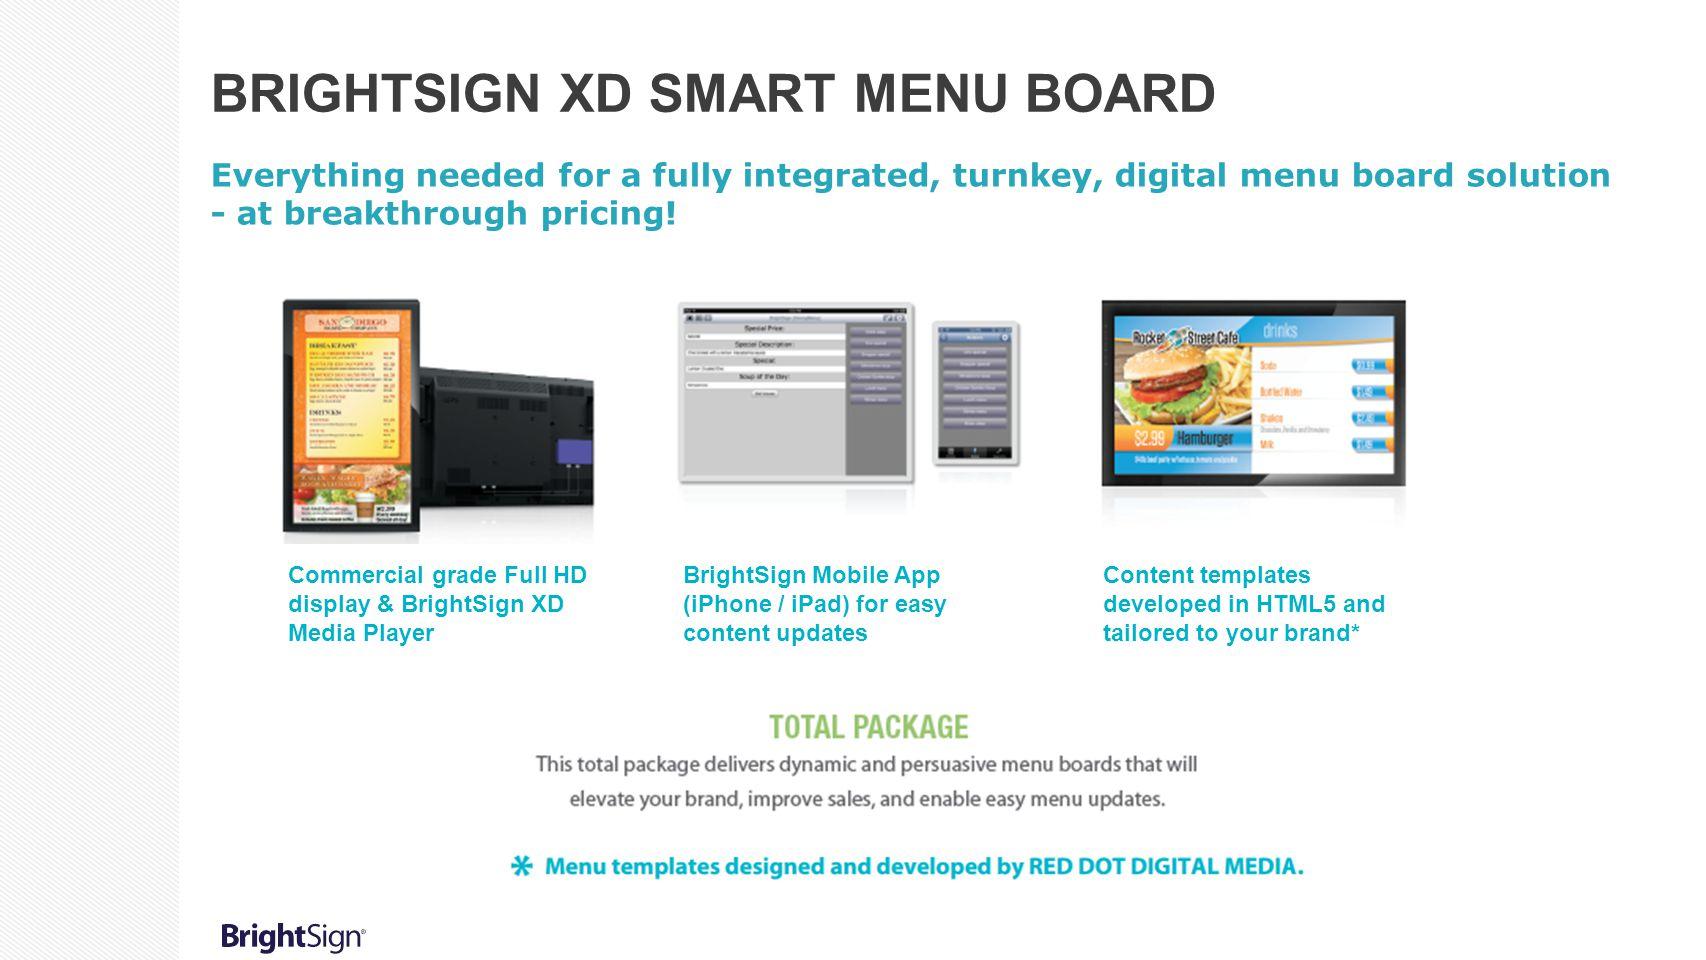 BrightSign XD Smart Menu Board